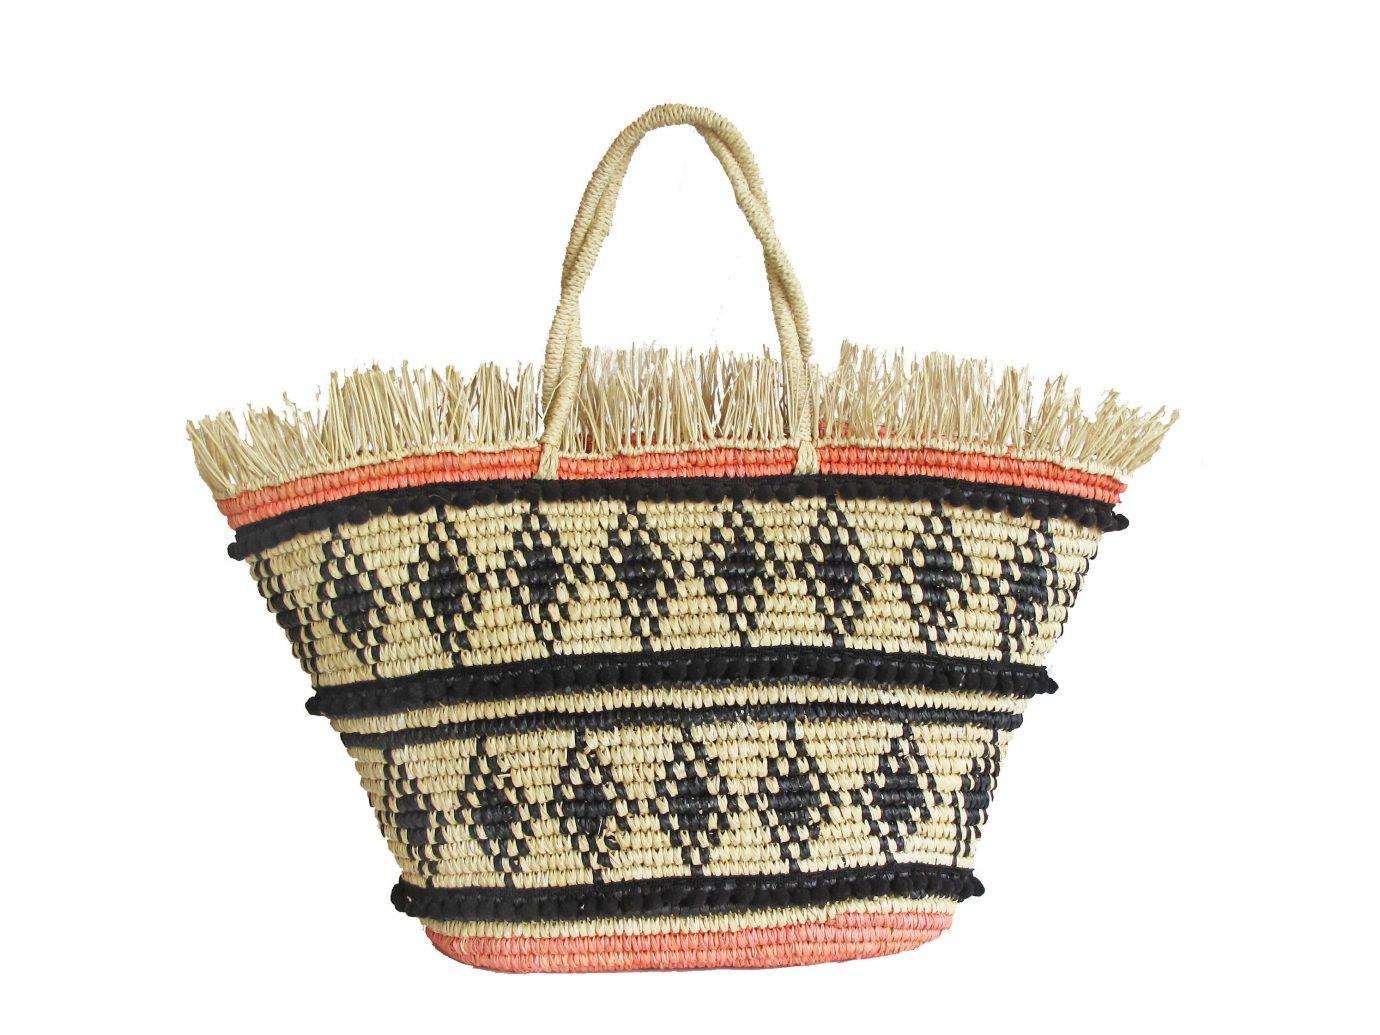 Style Design Handbag Basket Fashion Accessory Product Storage Lighting Pattern